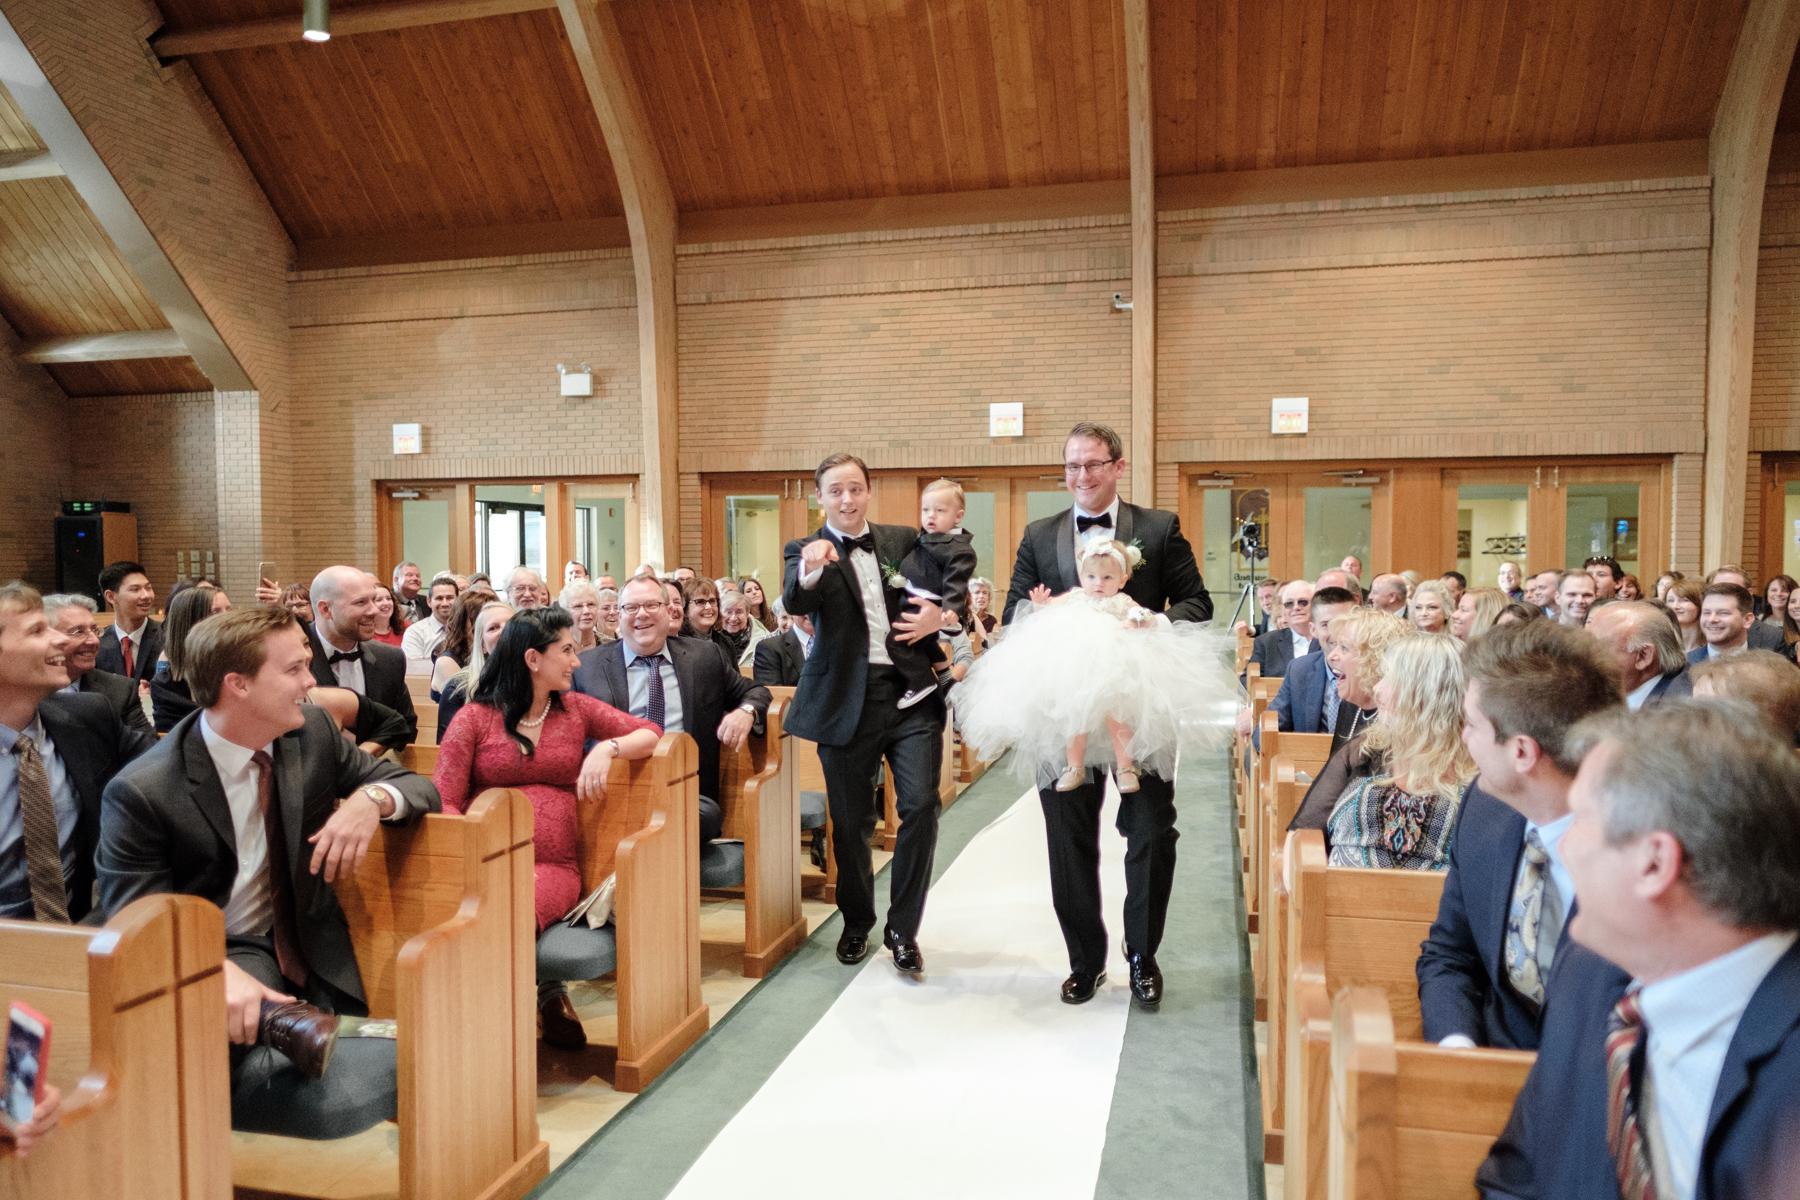 2017_BAP_KalliMatt_Gleneagles_CountryClub_Lemont_Wedding-33.jpg